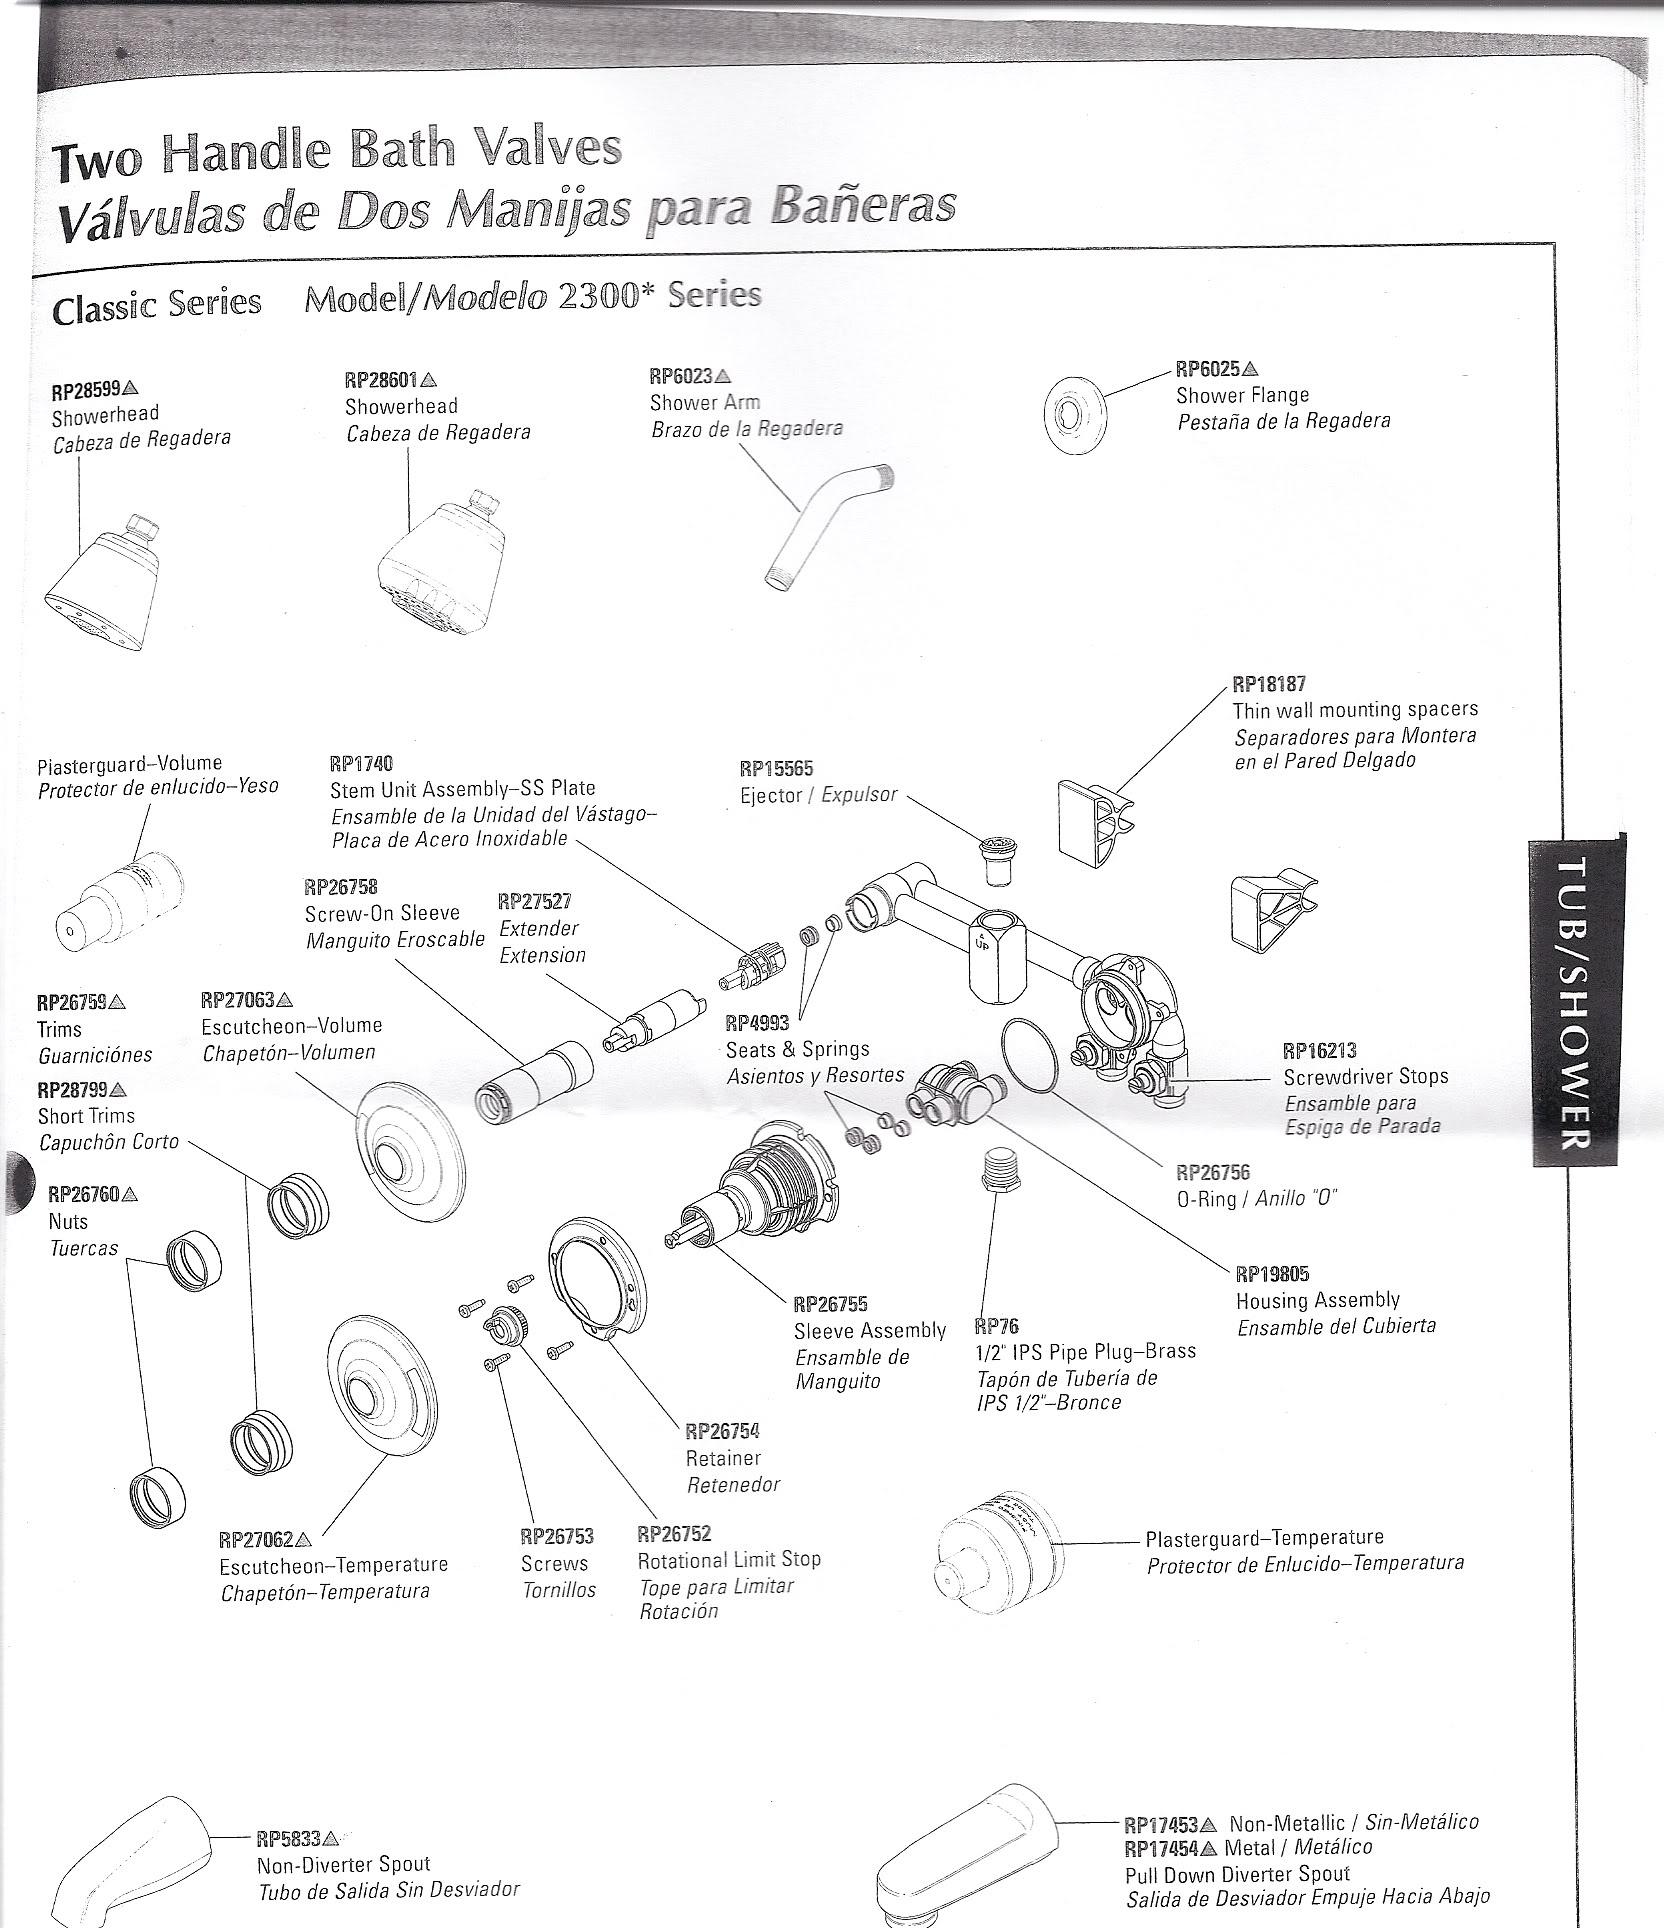 Co 9822 Moen Faucets Diagrams Together With Moen Bathroom Faucet Parts Diagram Download Diagram